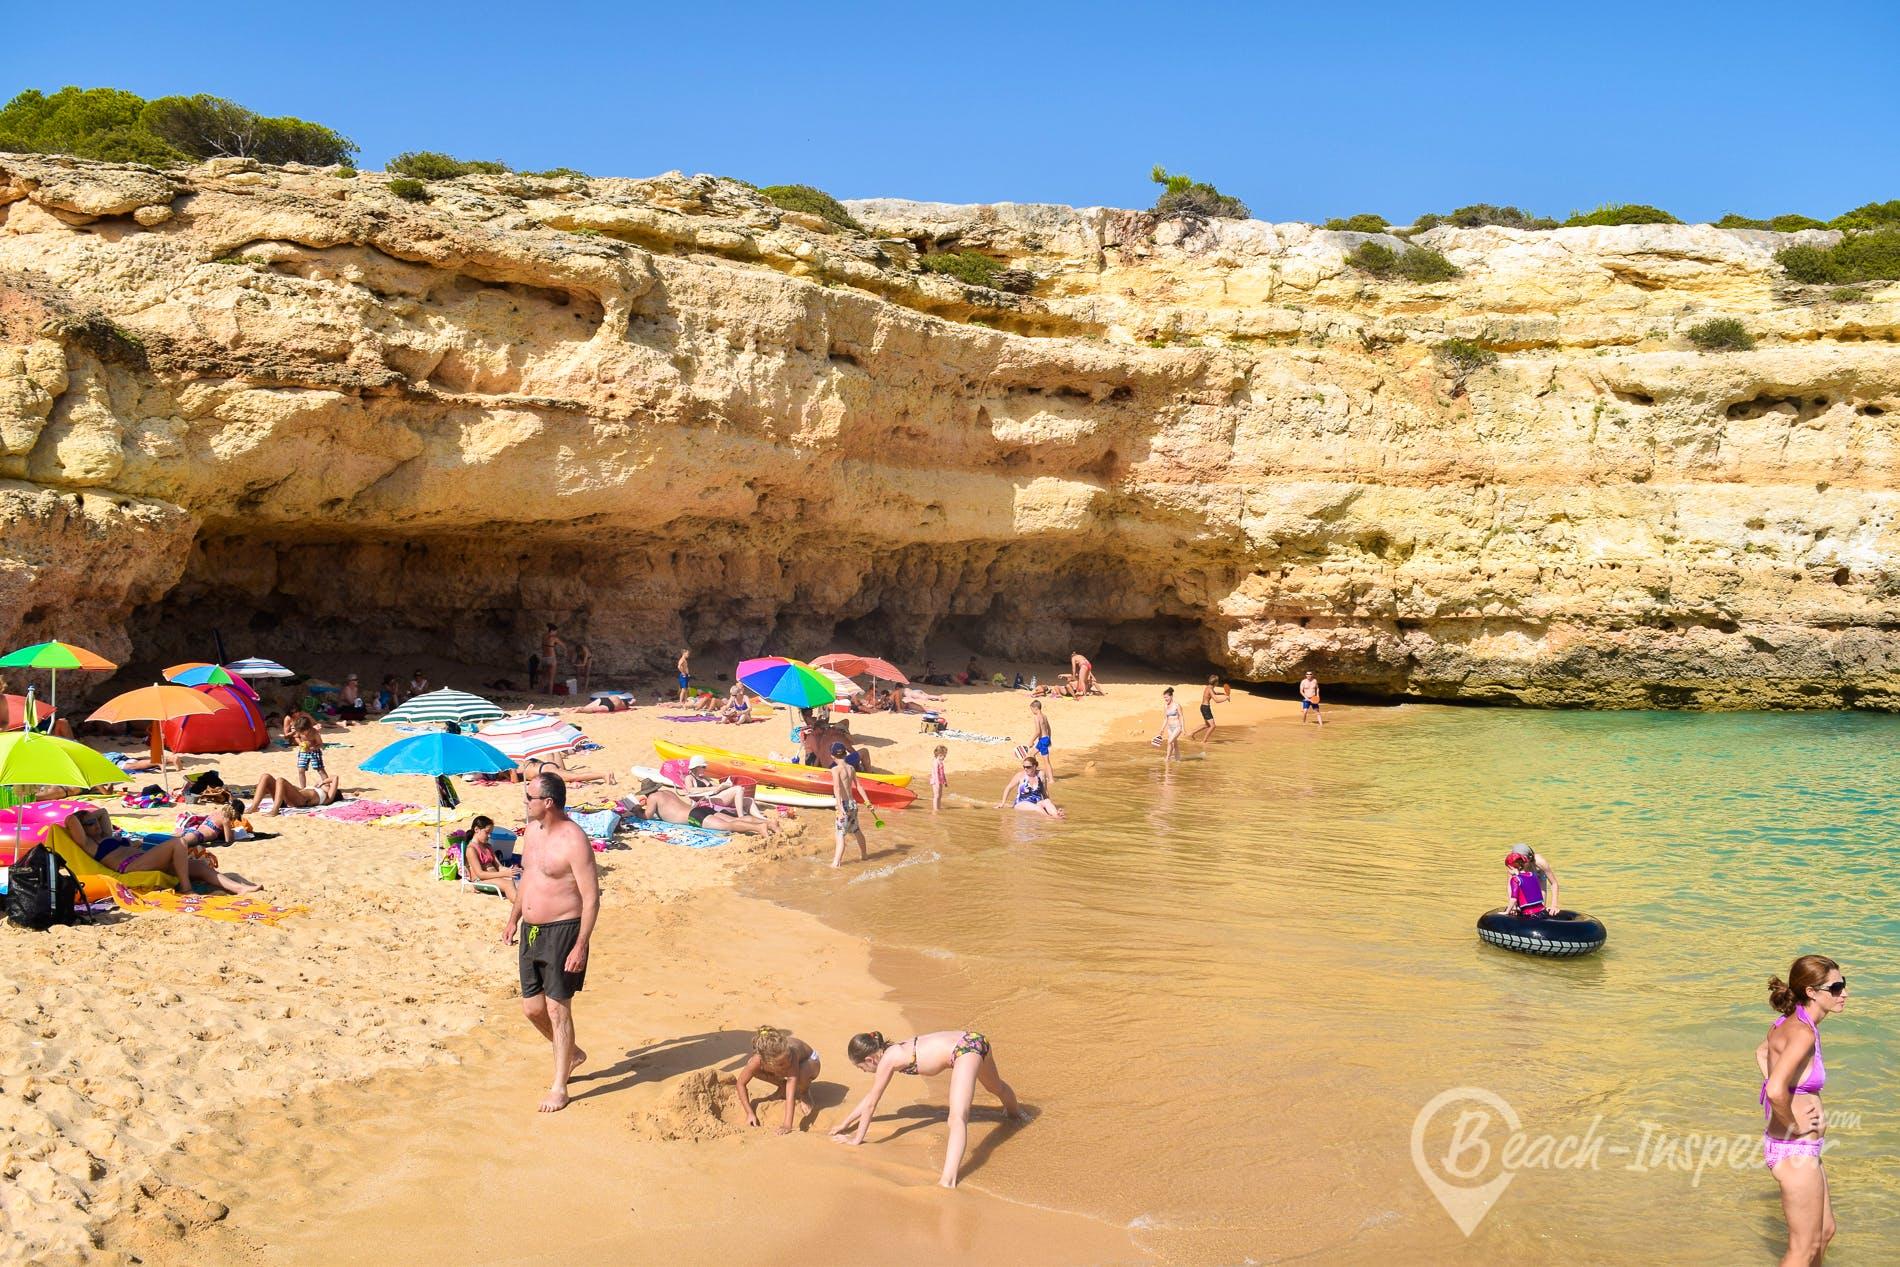 Beach Praia de Albandeira, Algarve, Portugal